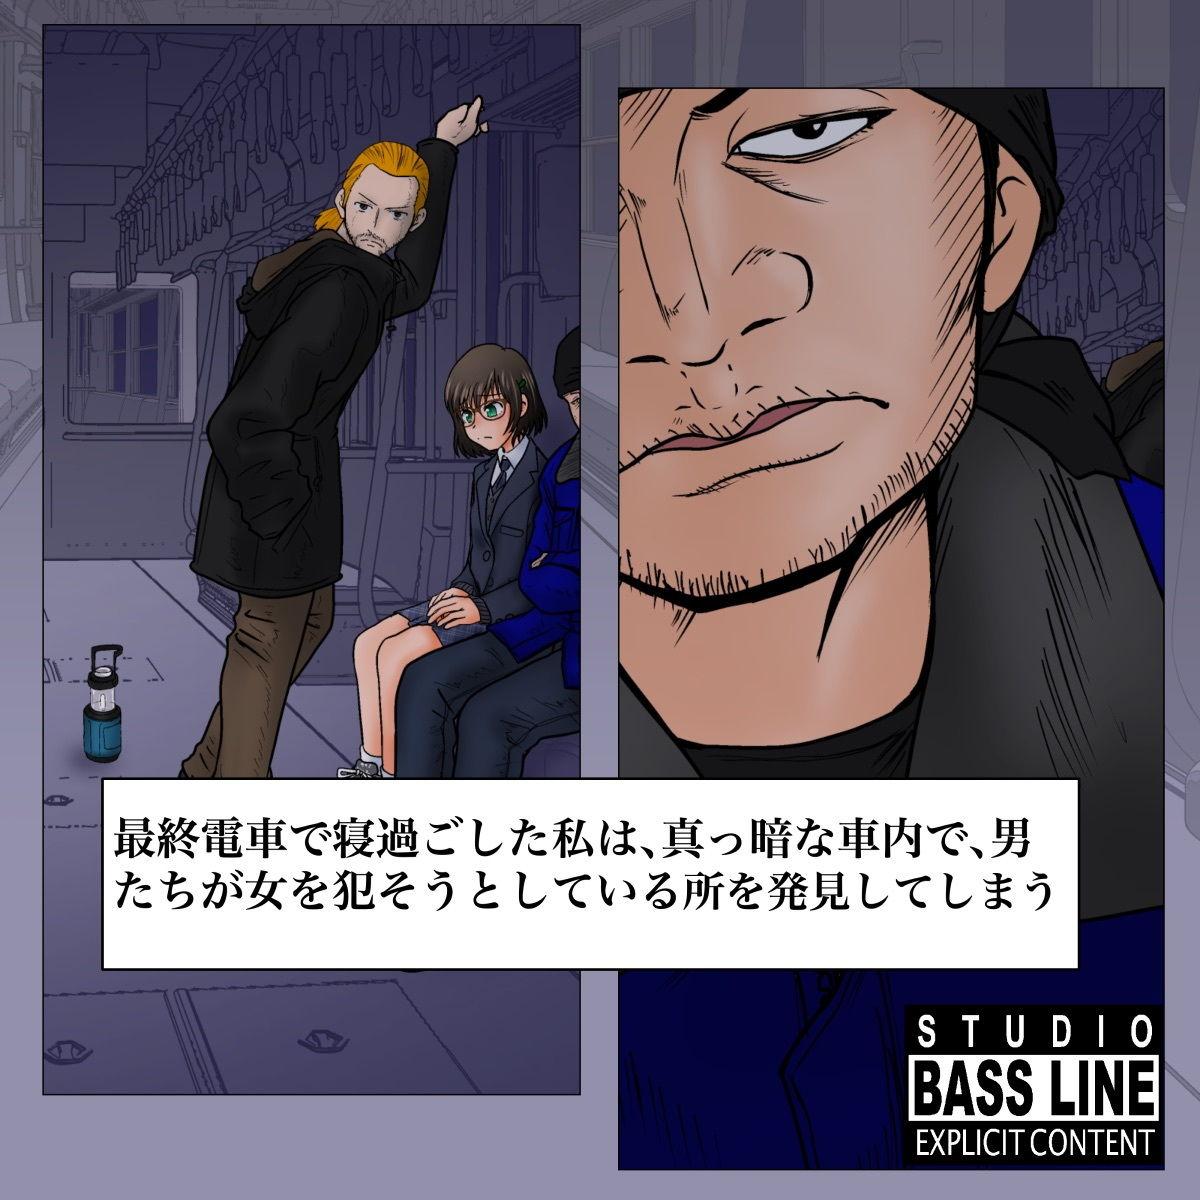 【STUDIO BASS LINE 同人】男の娘最終輪●電車